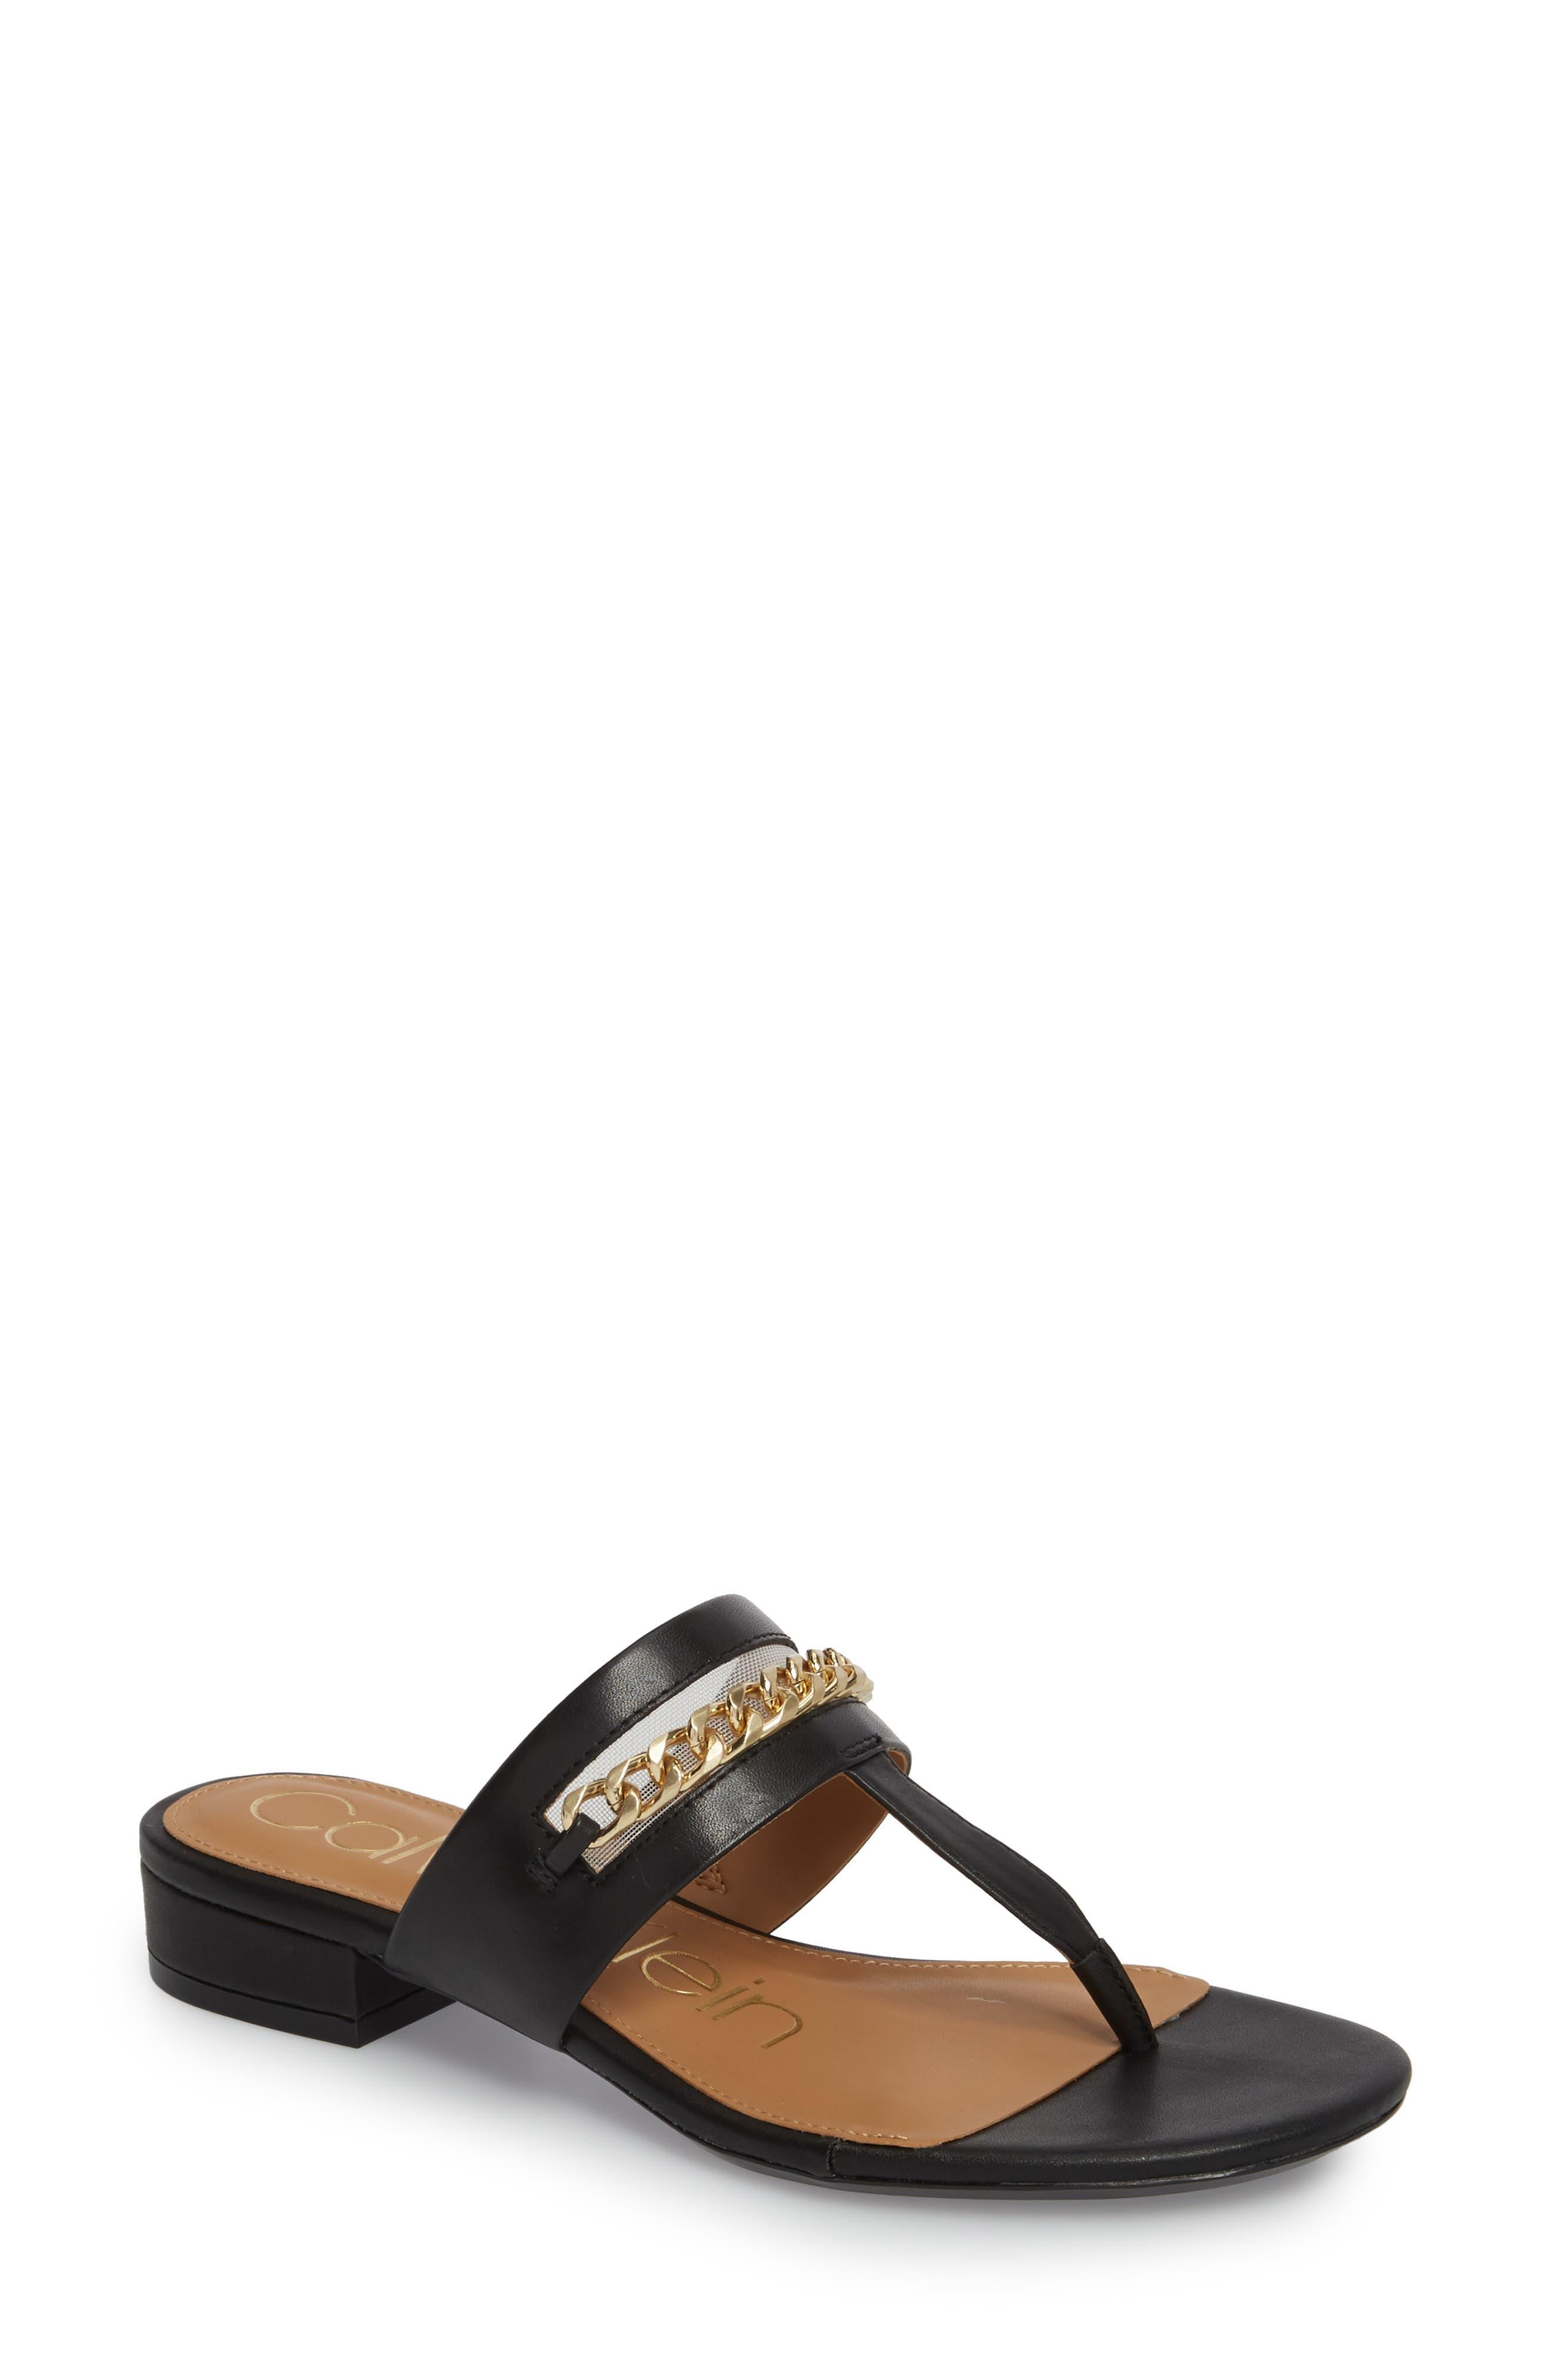 Francie Sandal,                         Main,                         color, Black Leather